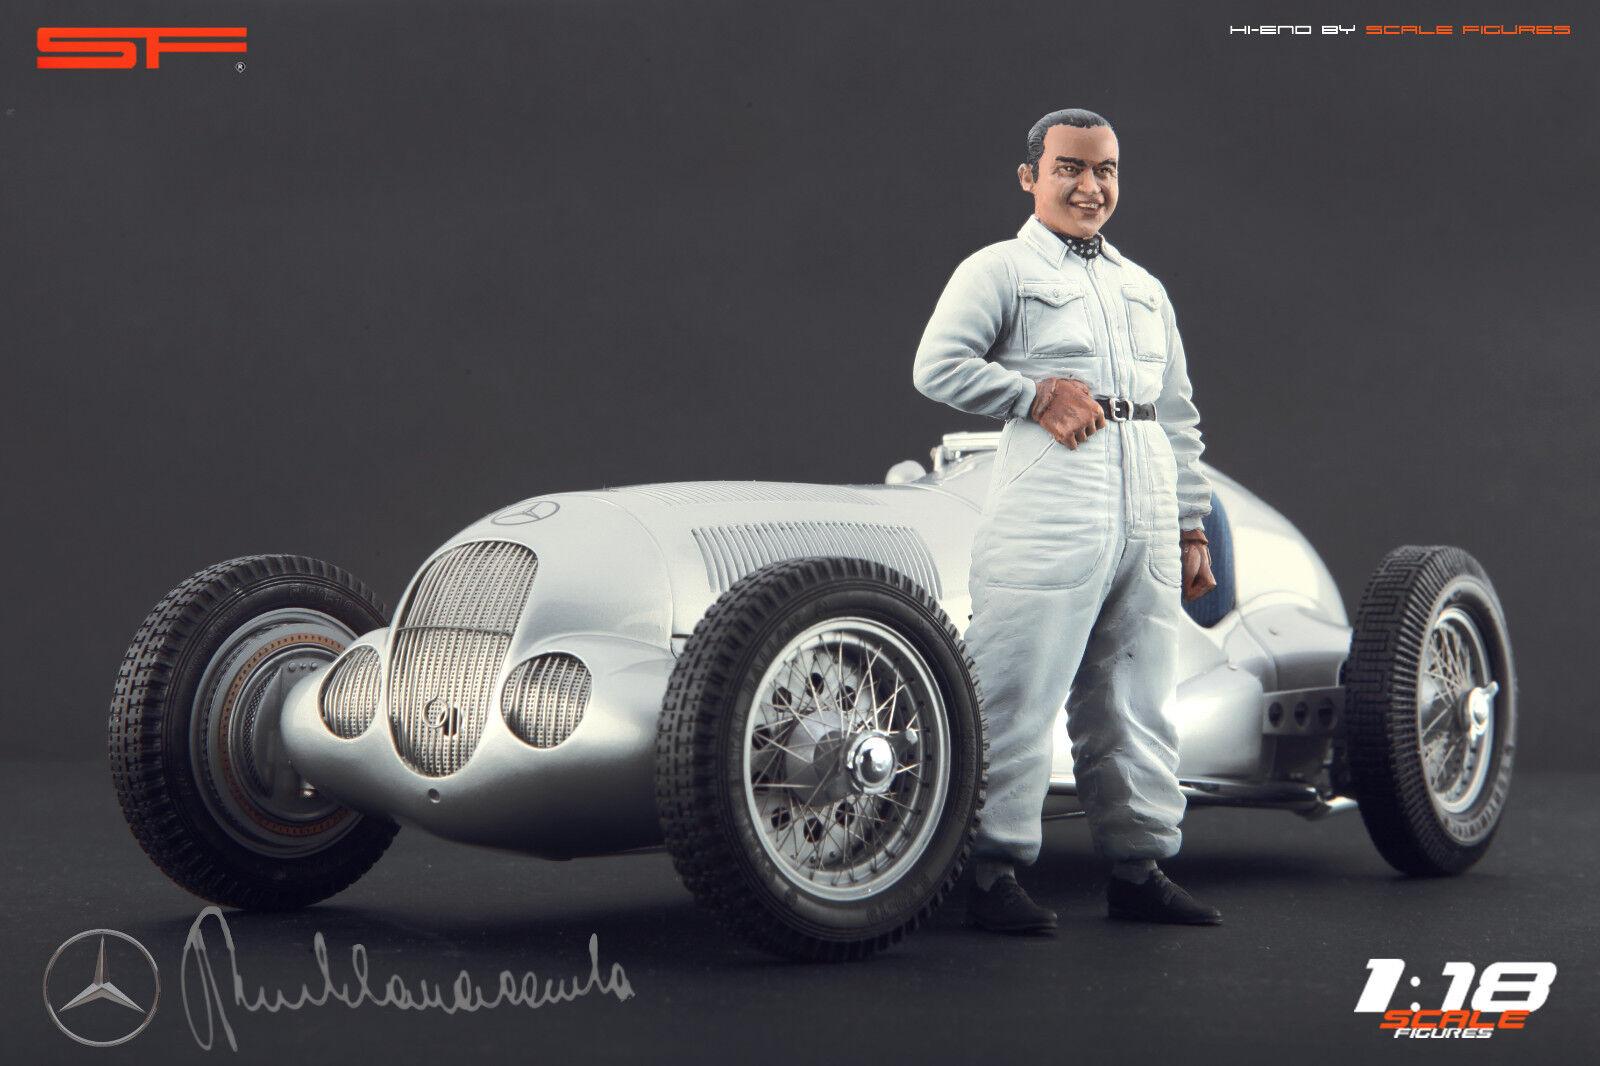 1 18 Rudolf Caracciola VERY RARE    figurine NO CARS    for diecast collectors